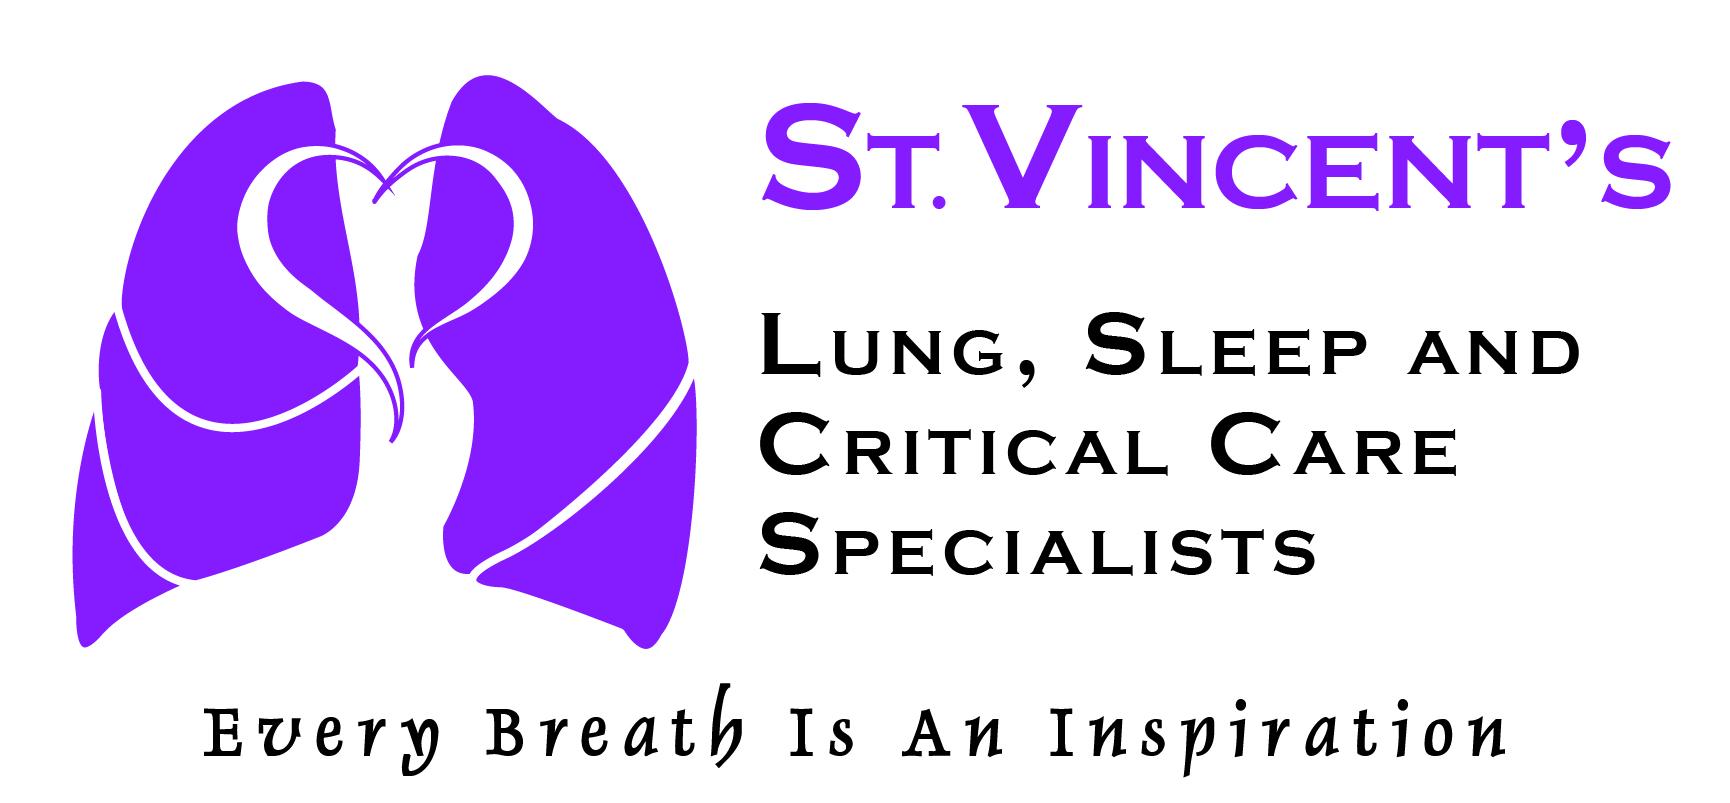 St_V_lung_print